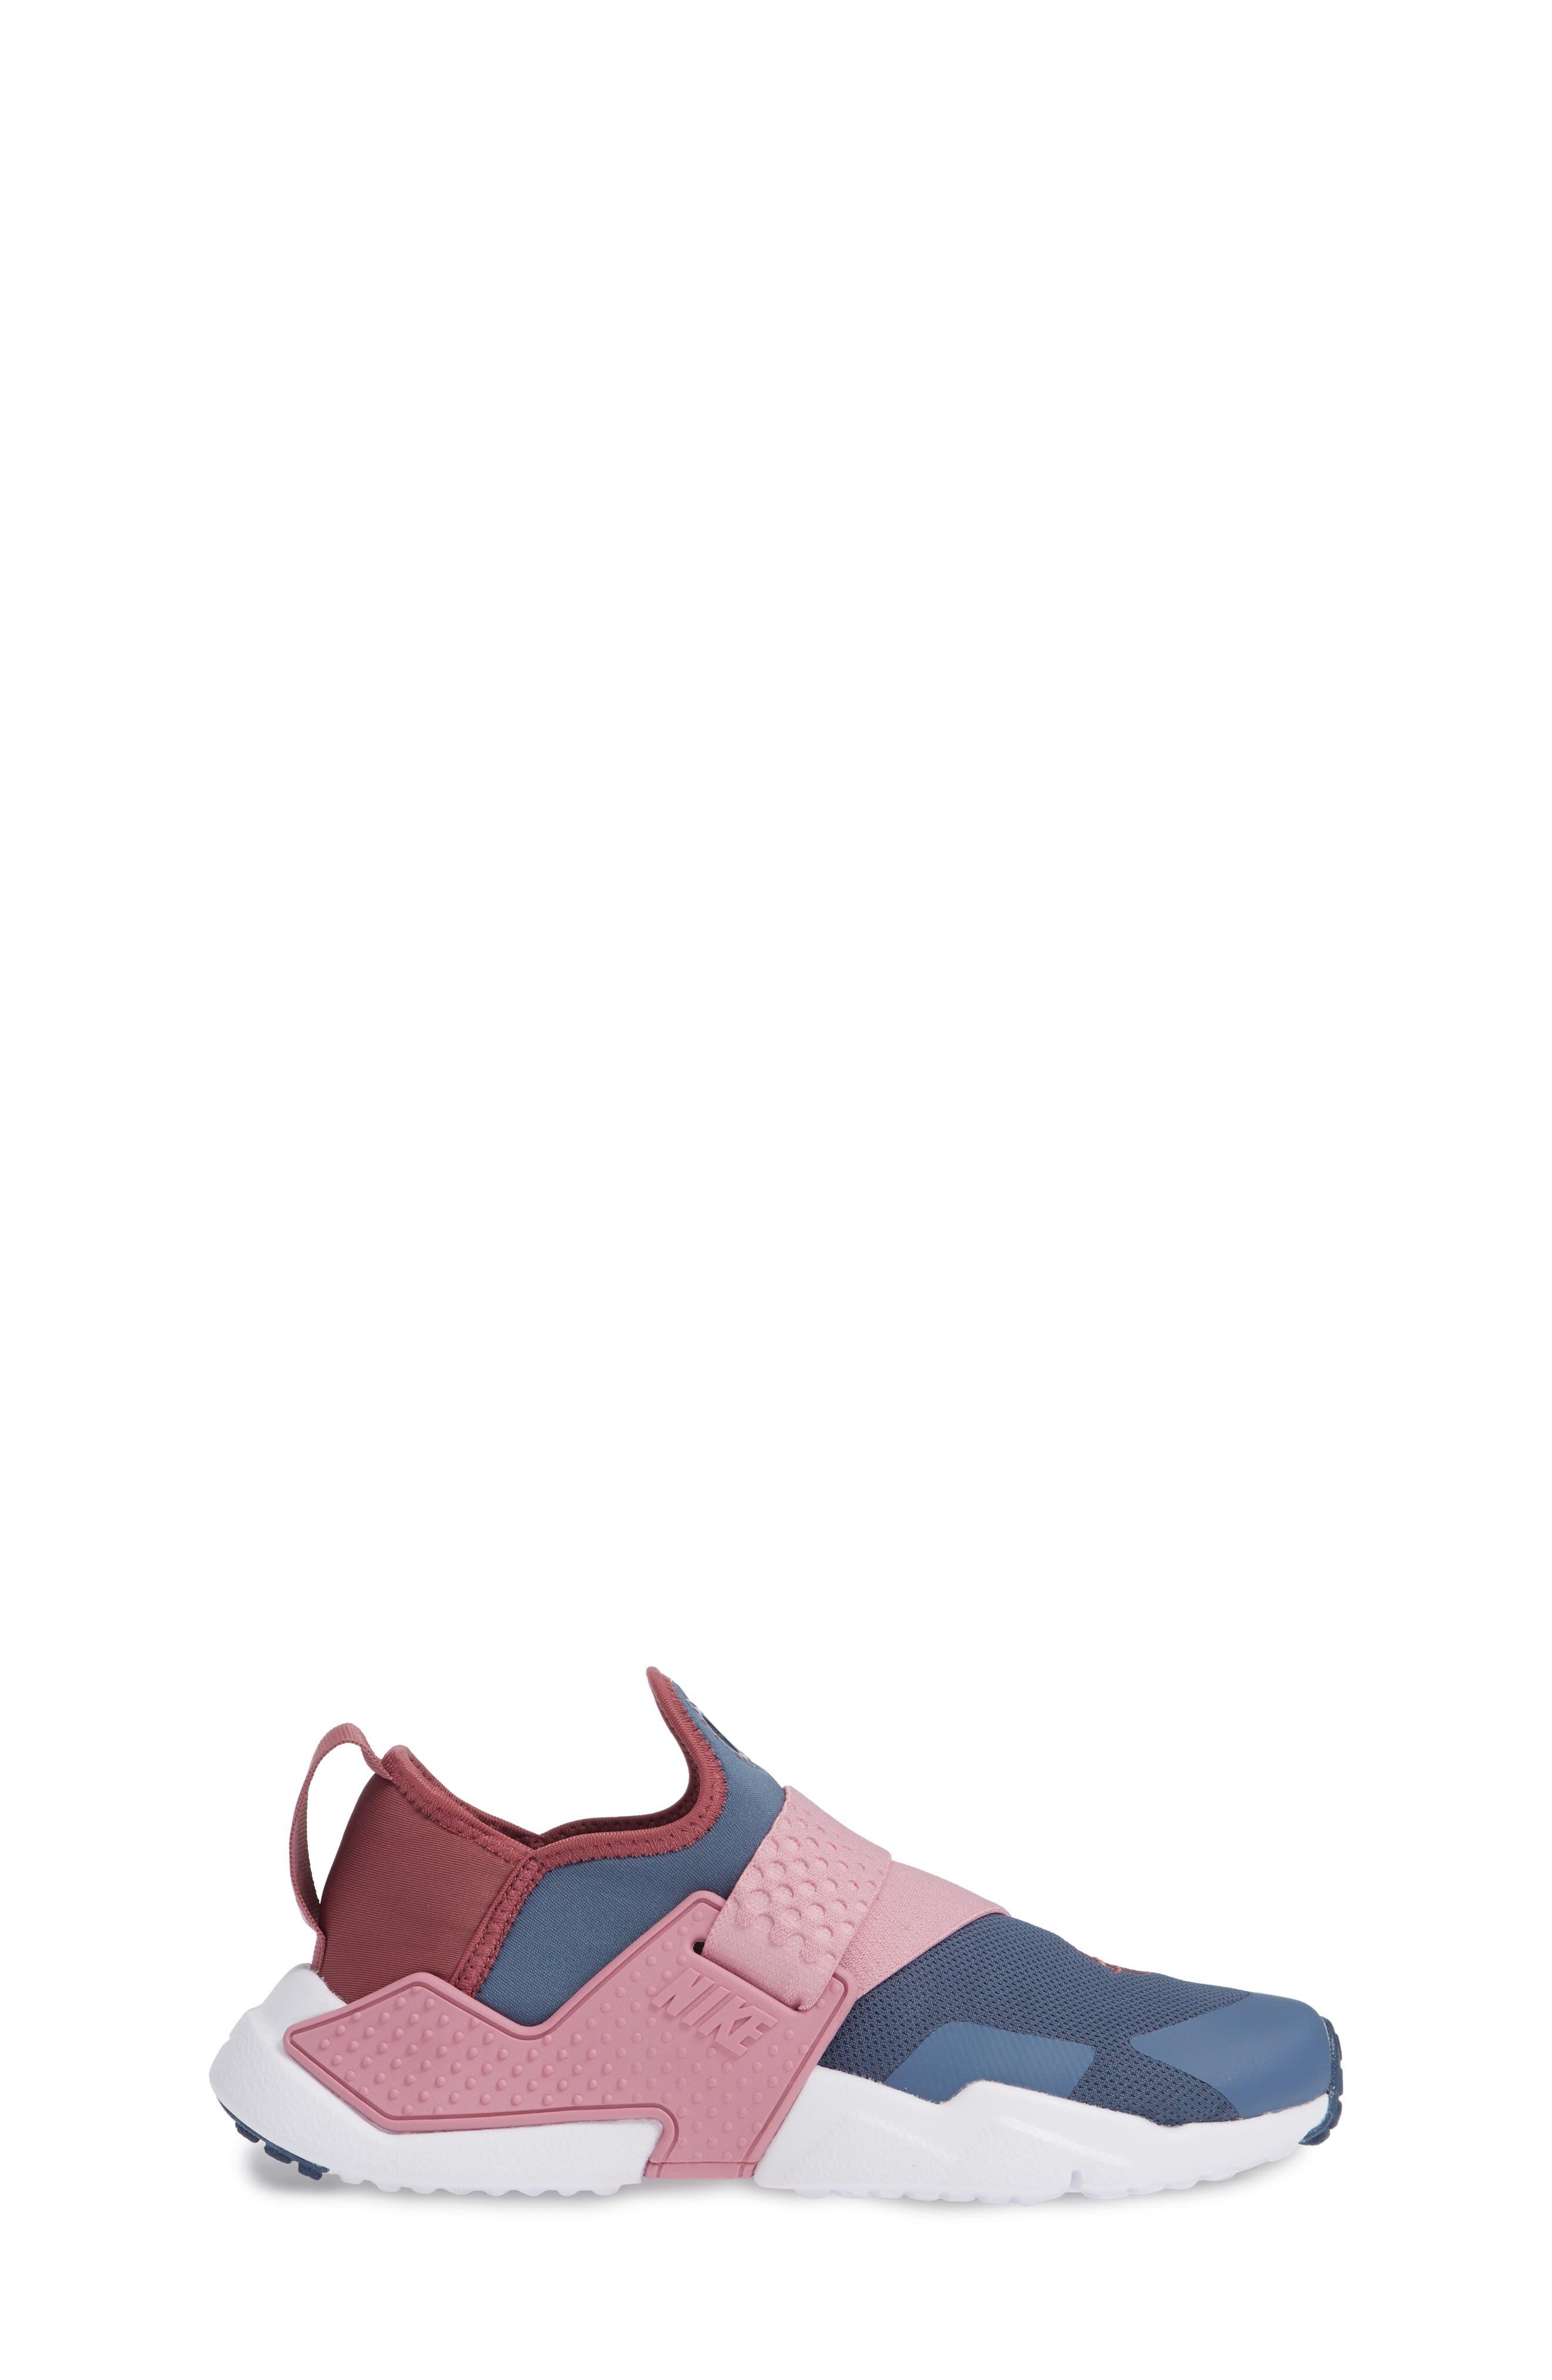 Huarache Extreme Sneaker,                             Alternate thumbnail 3, color,                             DIFFUSED BLUE